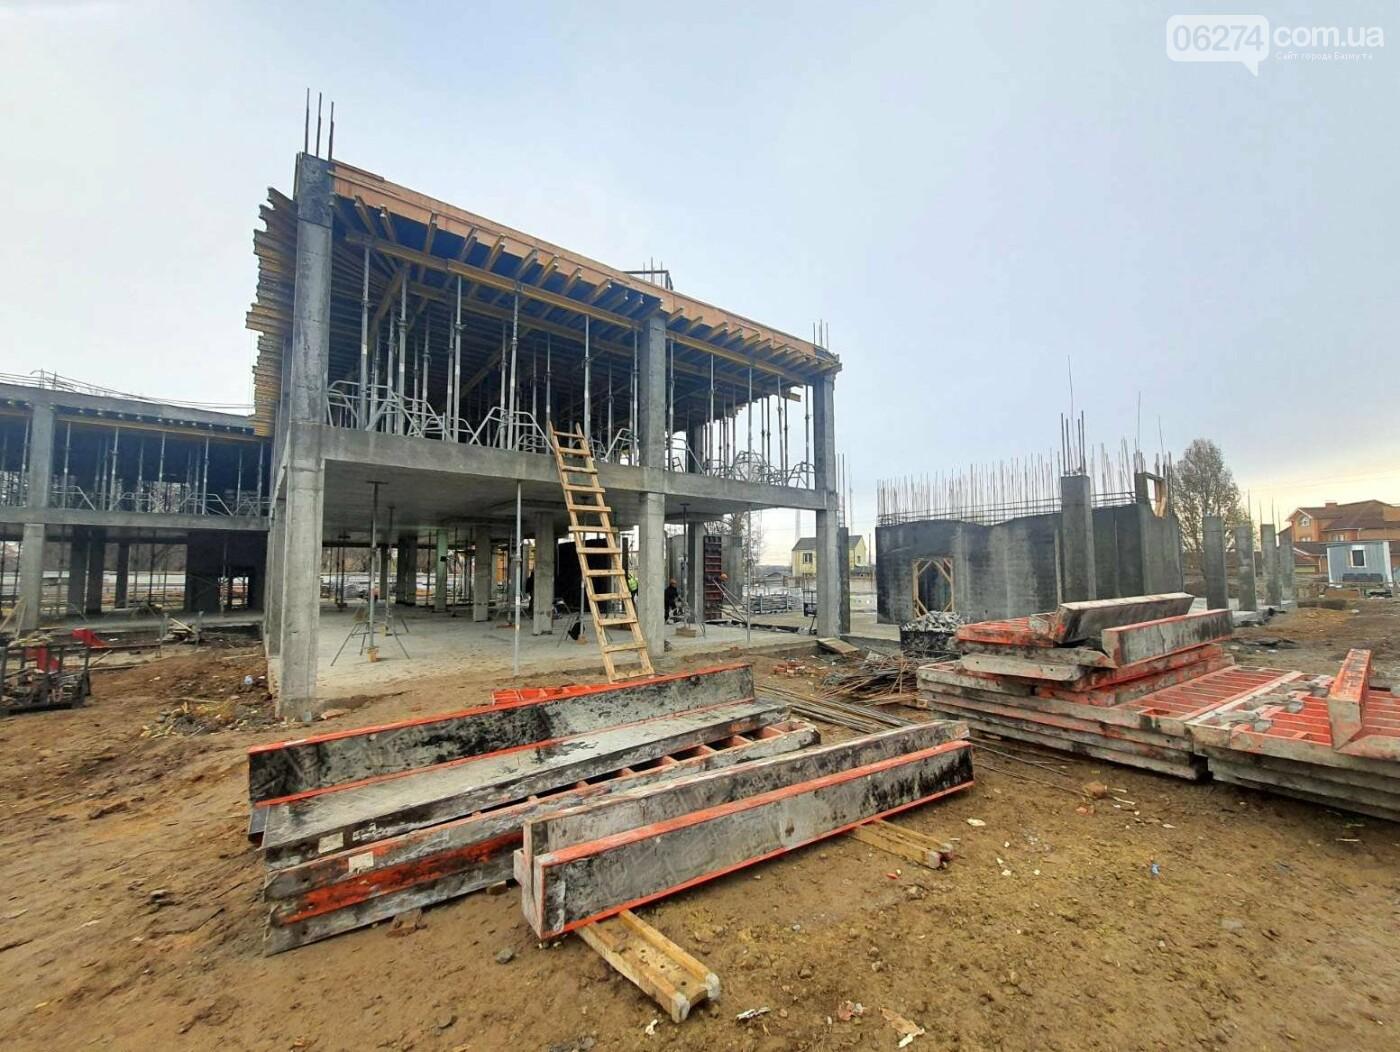 В Бахмуте начали возведение этажей учебного корпуса спортивного колледжа им. С. Бубки, фото-9